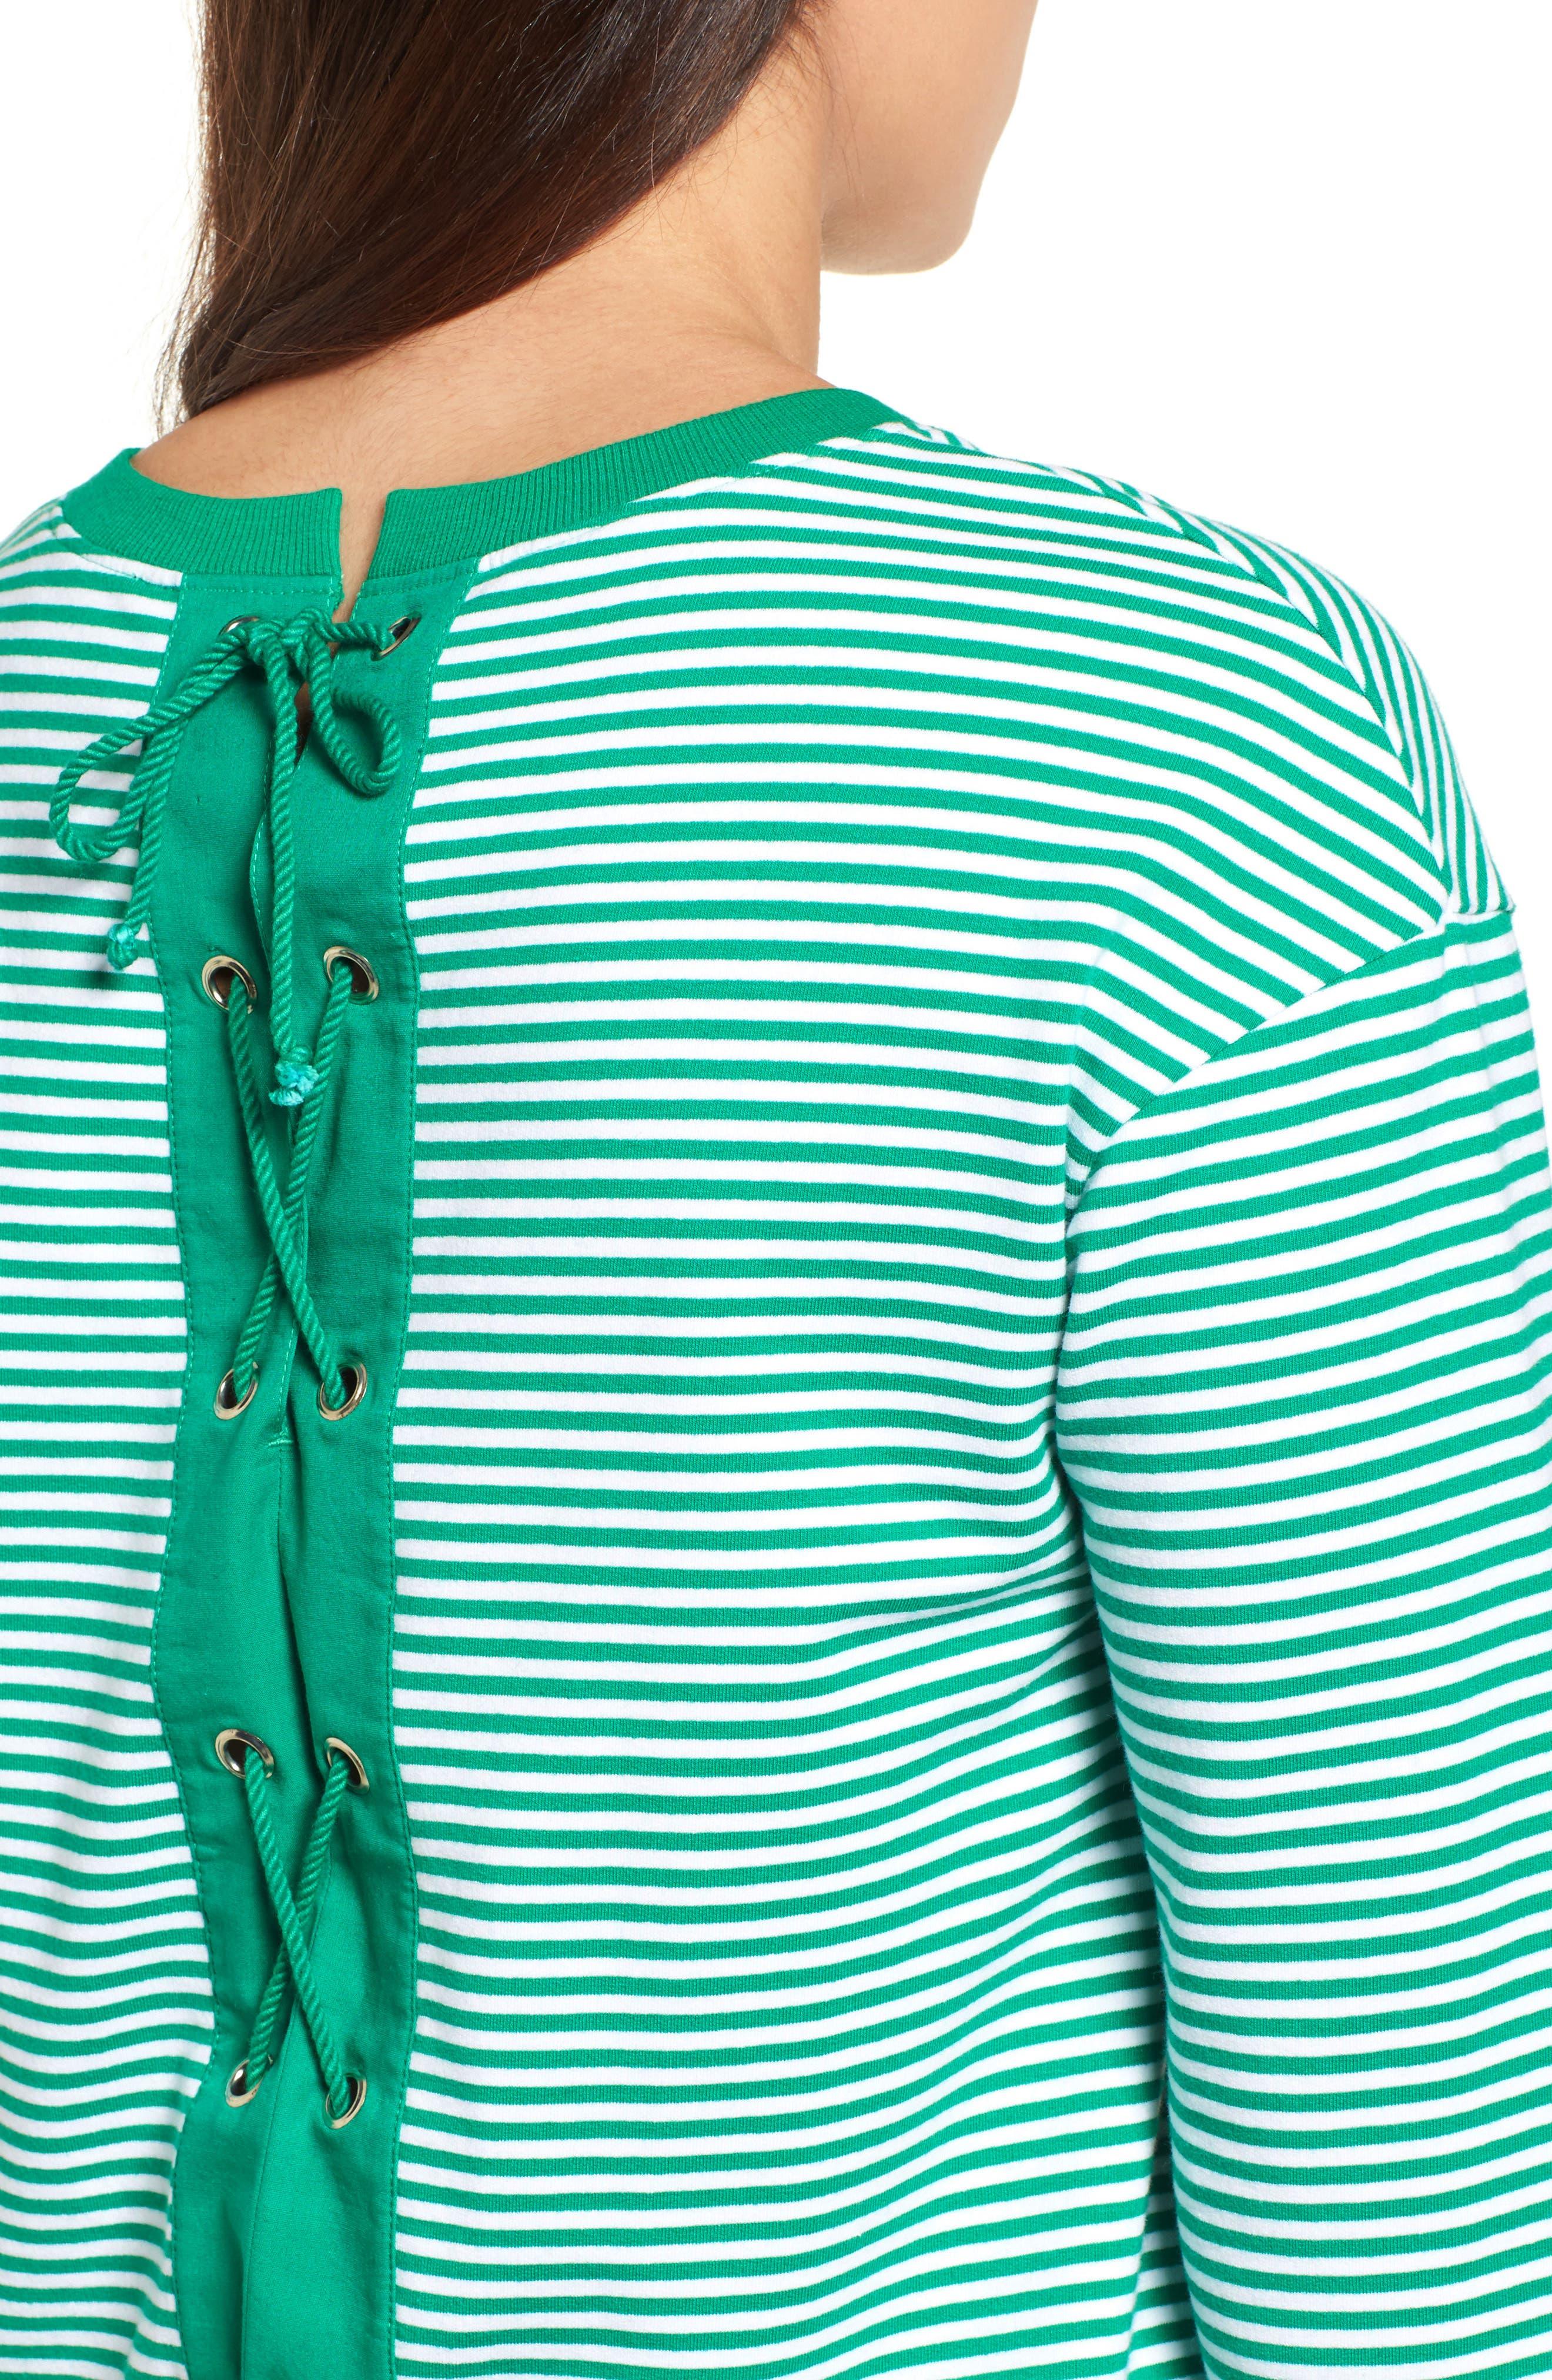 Lace-Up Knit Top,                             Alternate thumbnail 4, color,                             310